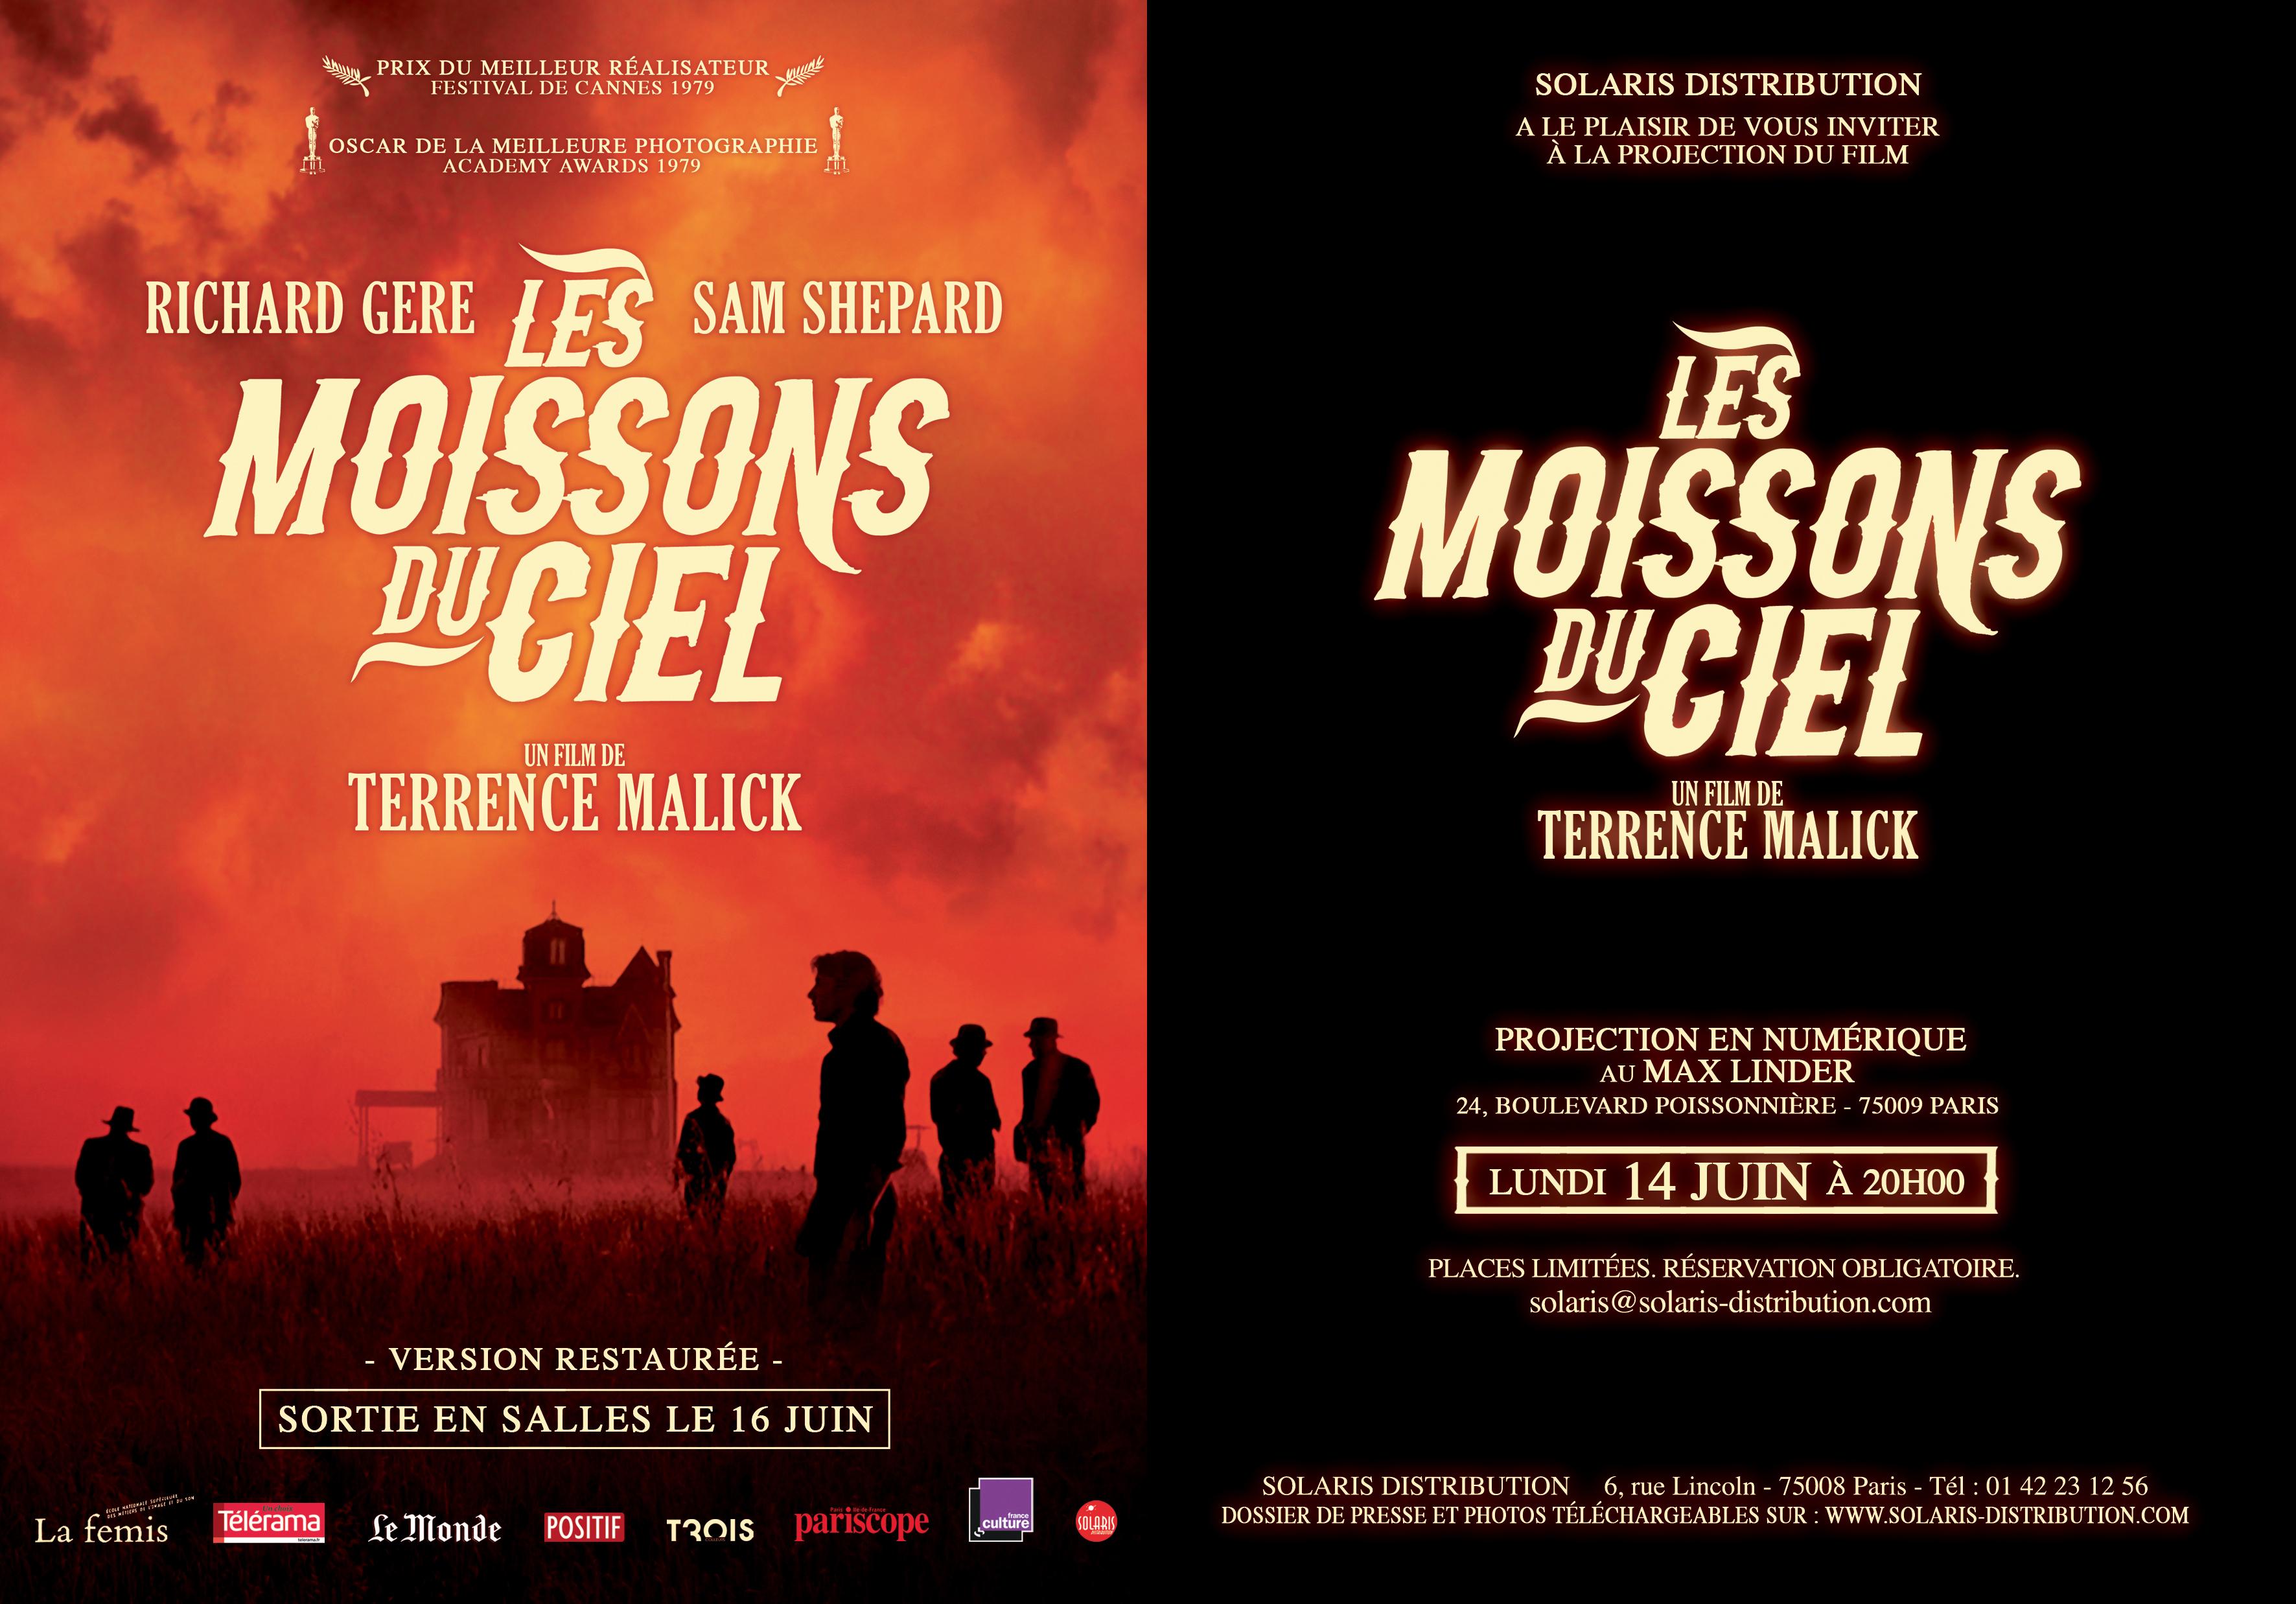 LES MOISSONS DU CIEL AVP